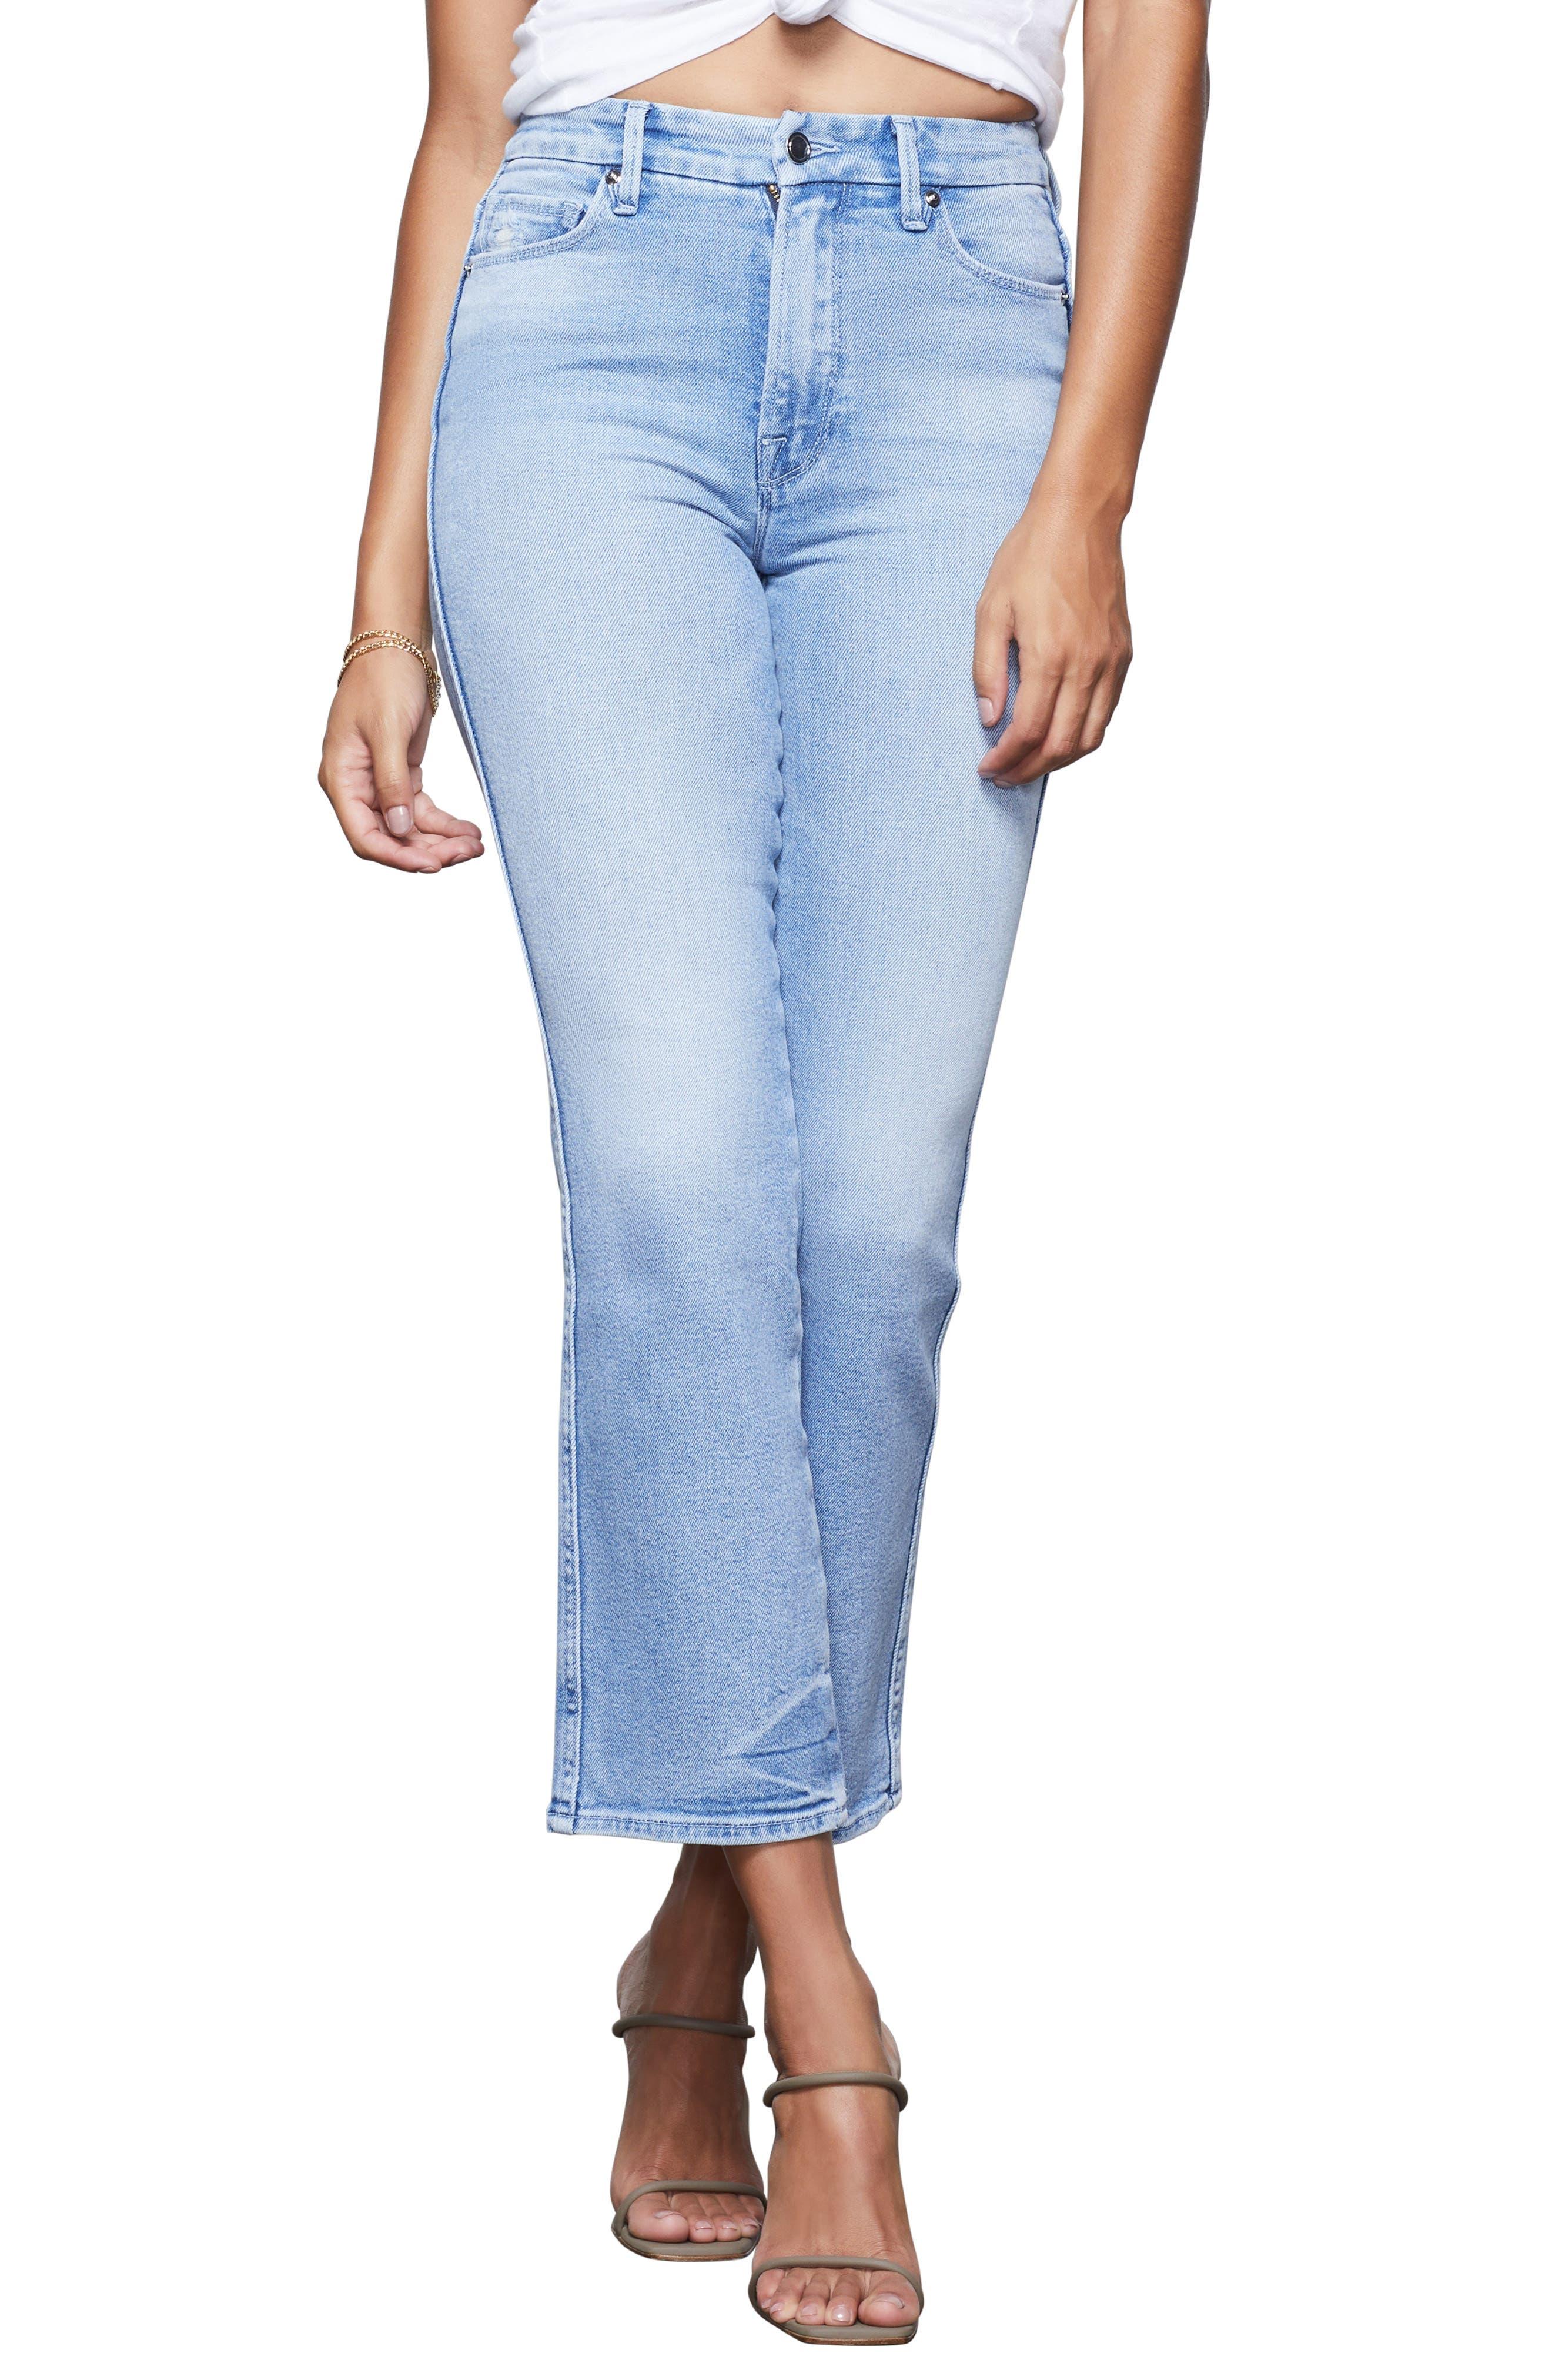 Image of Good American Good Curve High Waist Straight Leg Jeans